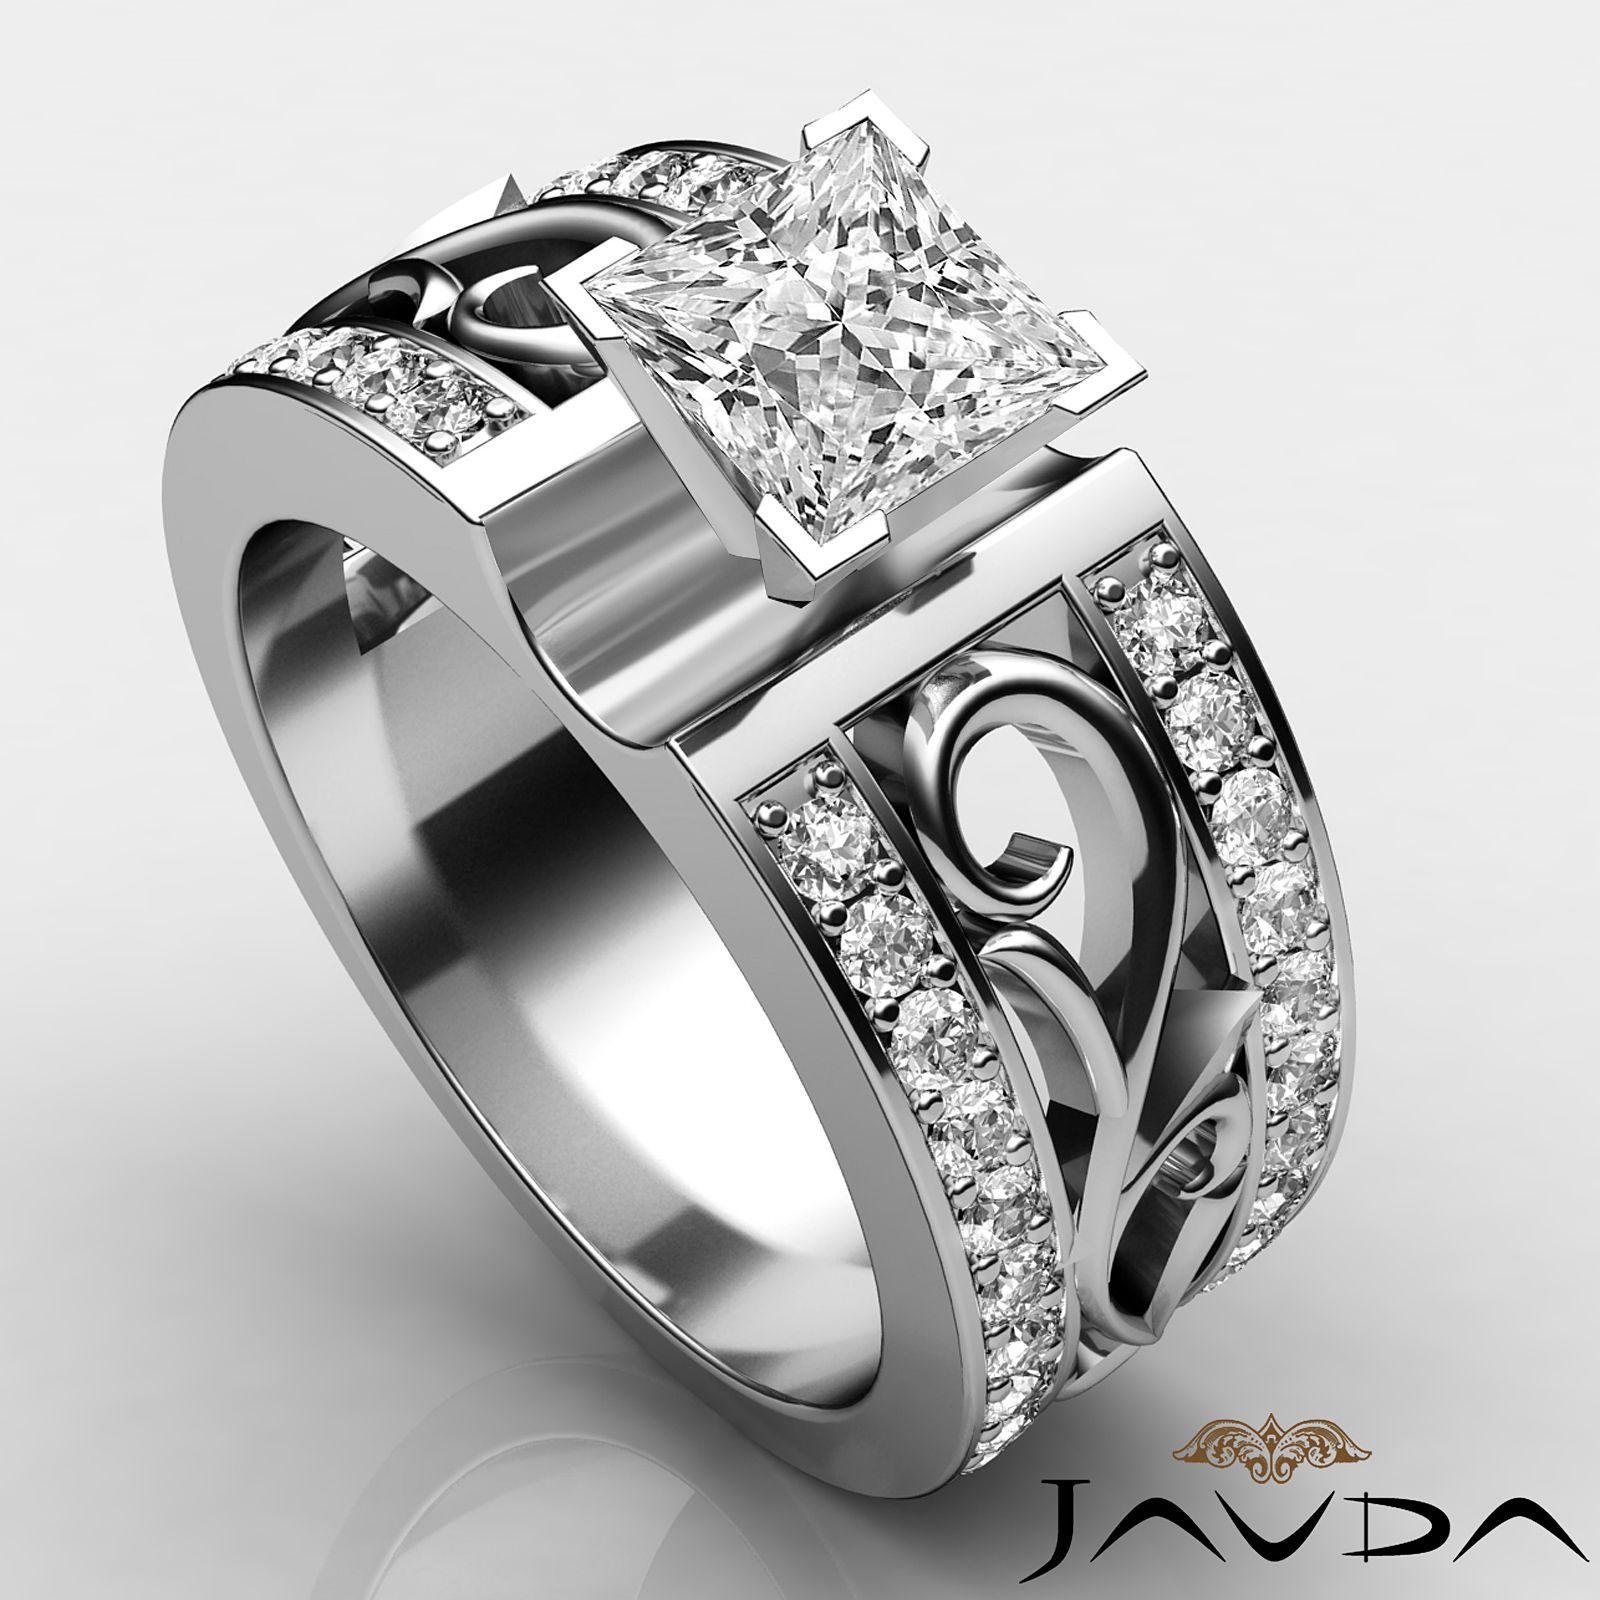 JAVDA Engagement Ring Mens wedding rings, Wedding rings